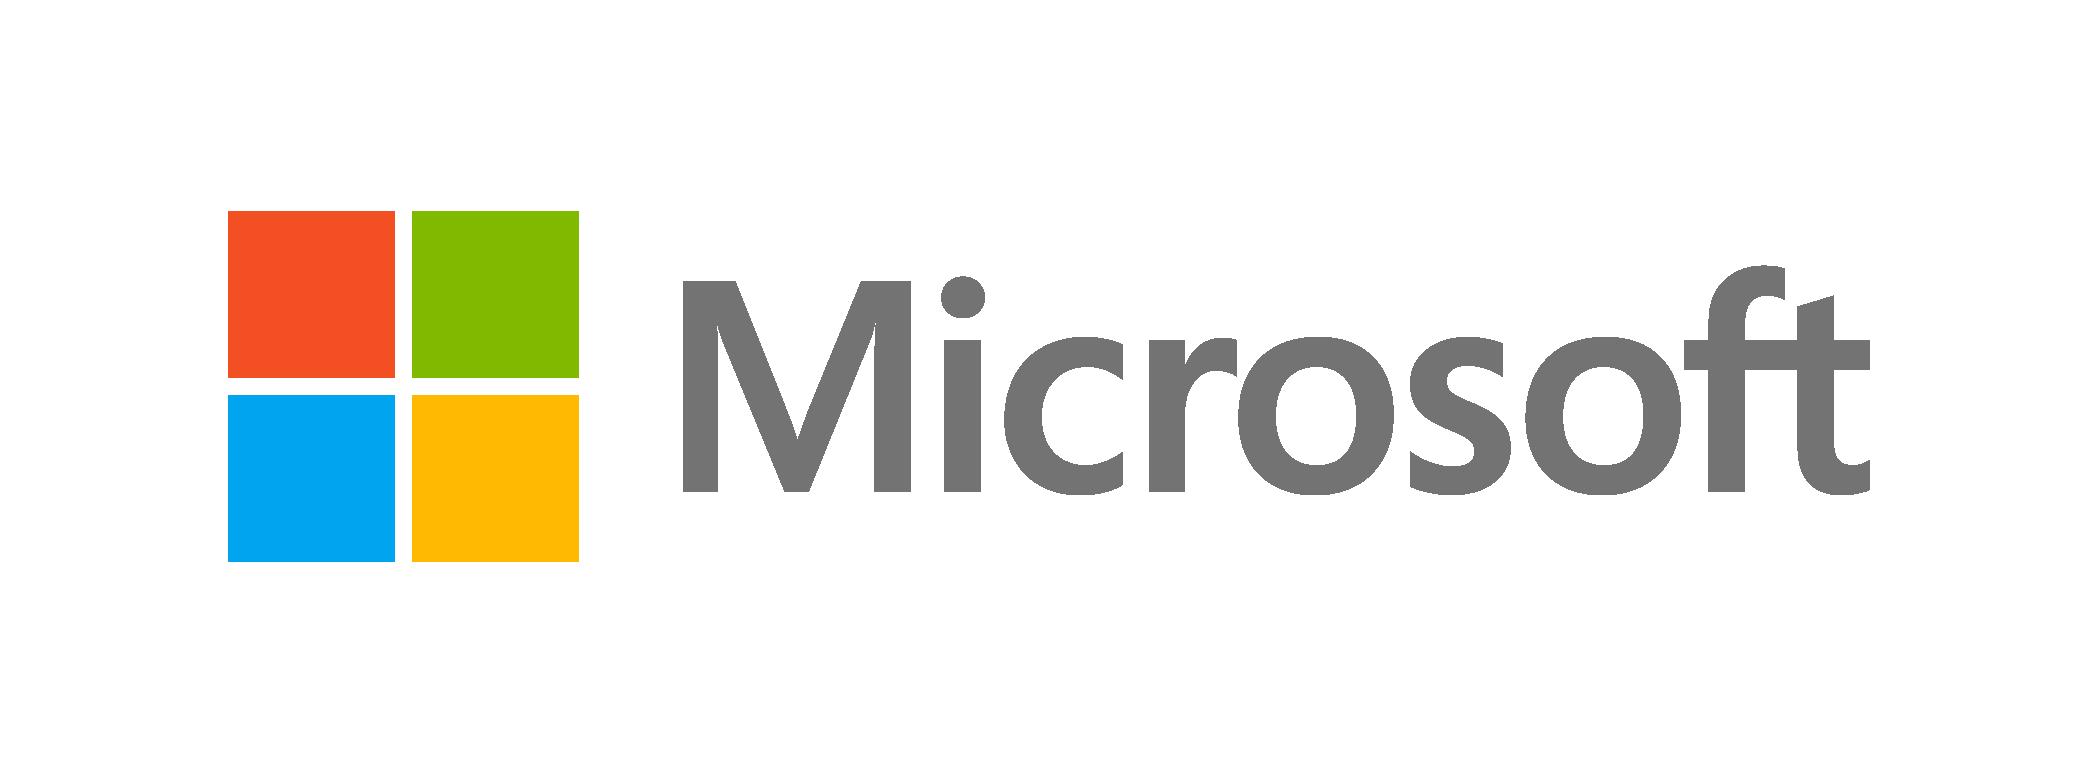 Microsoft-Logo-Transparent-Background